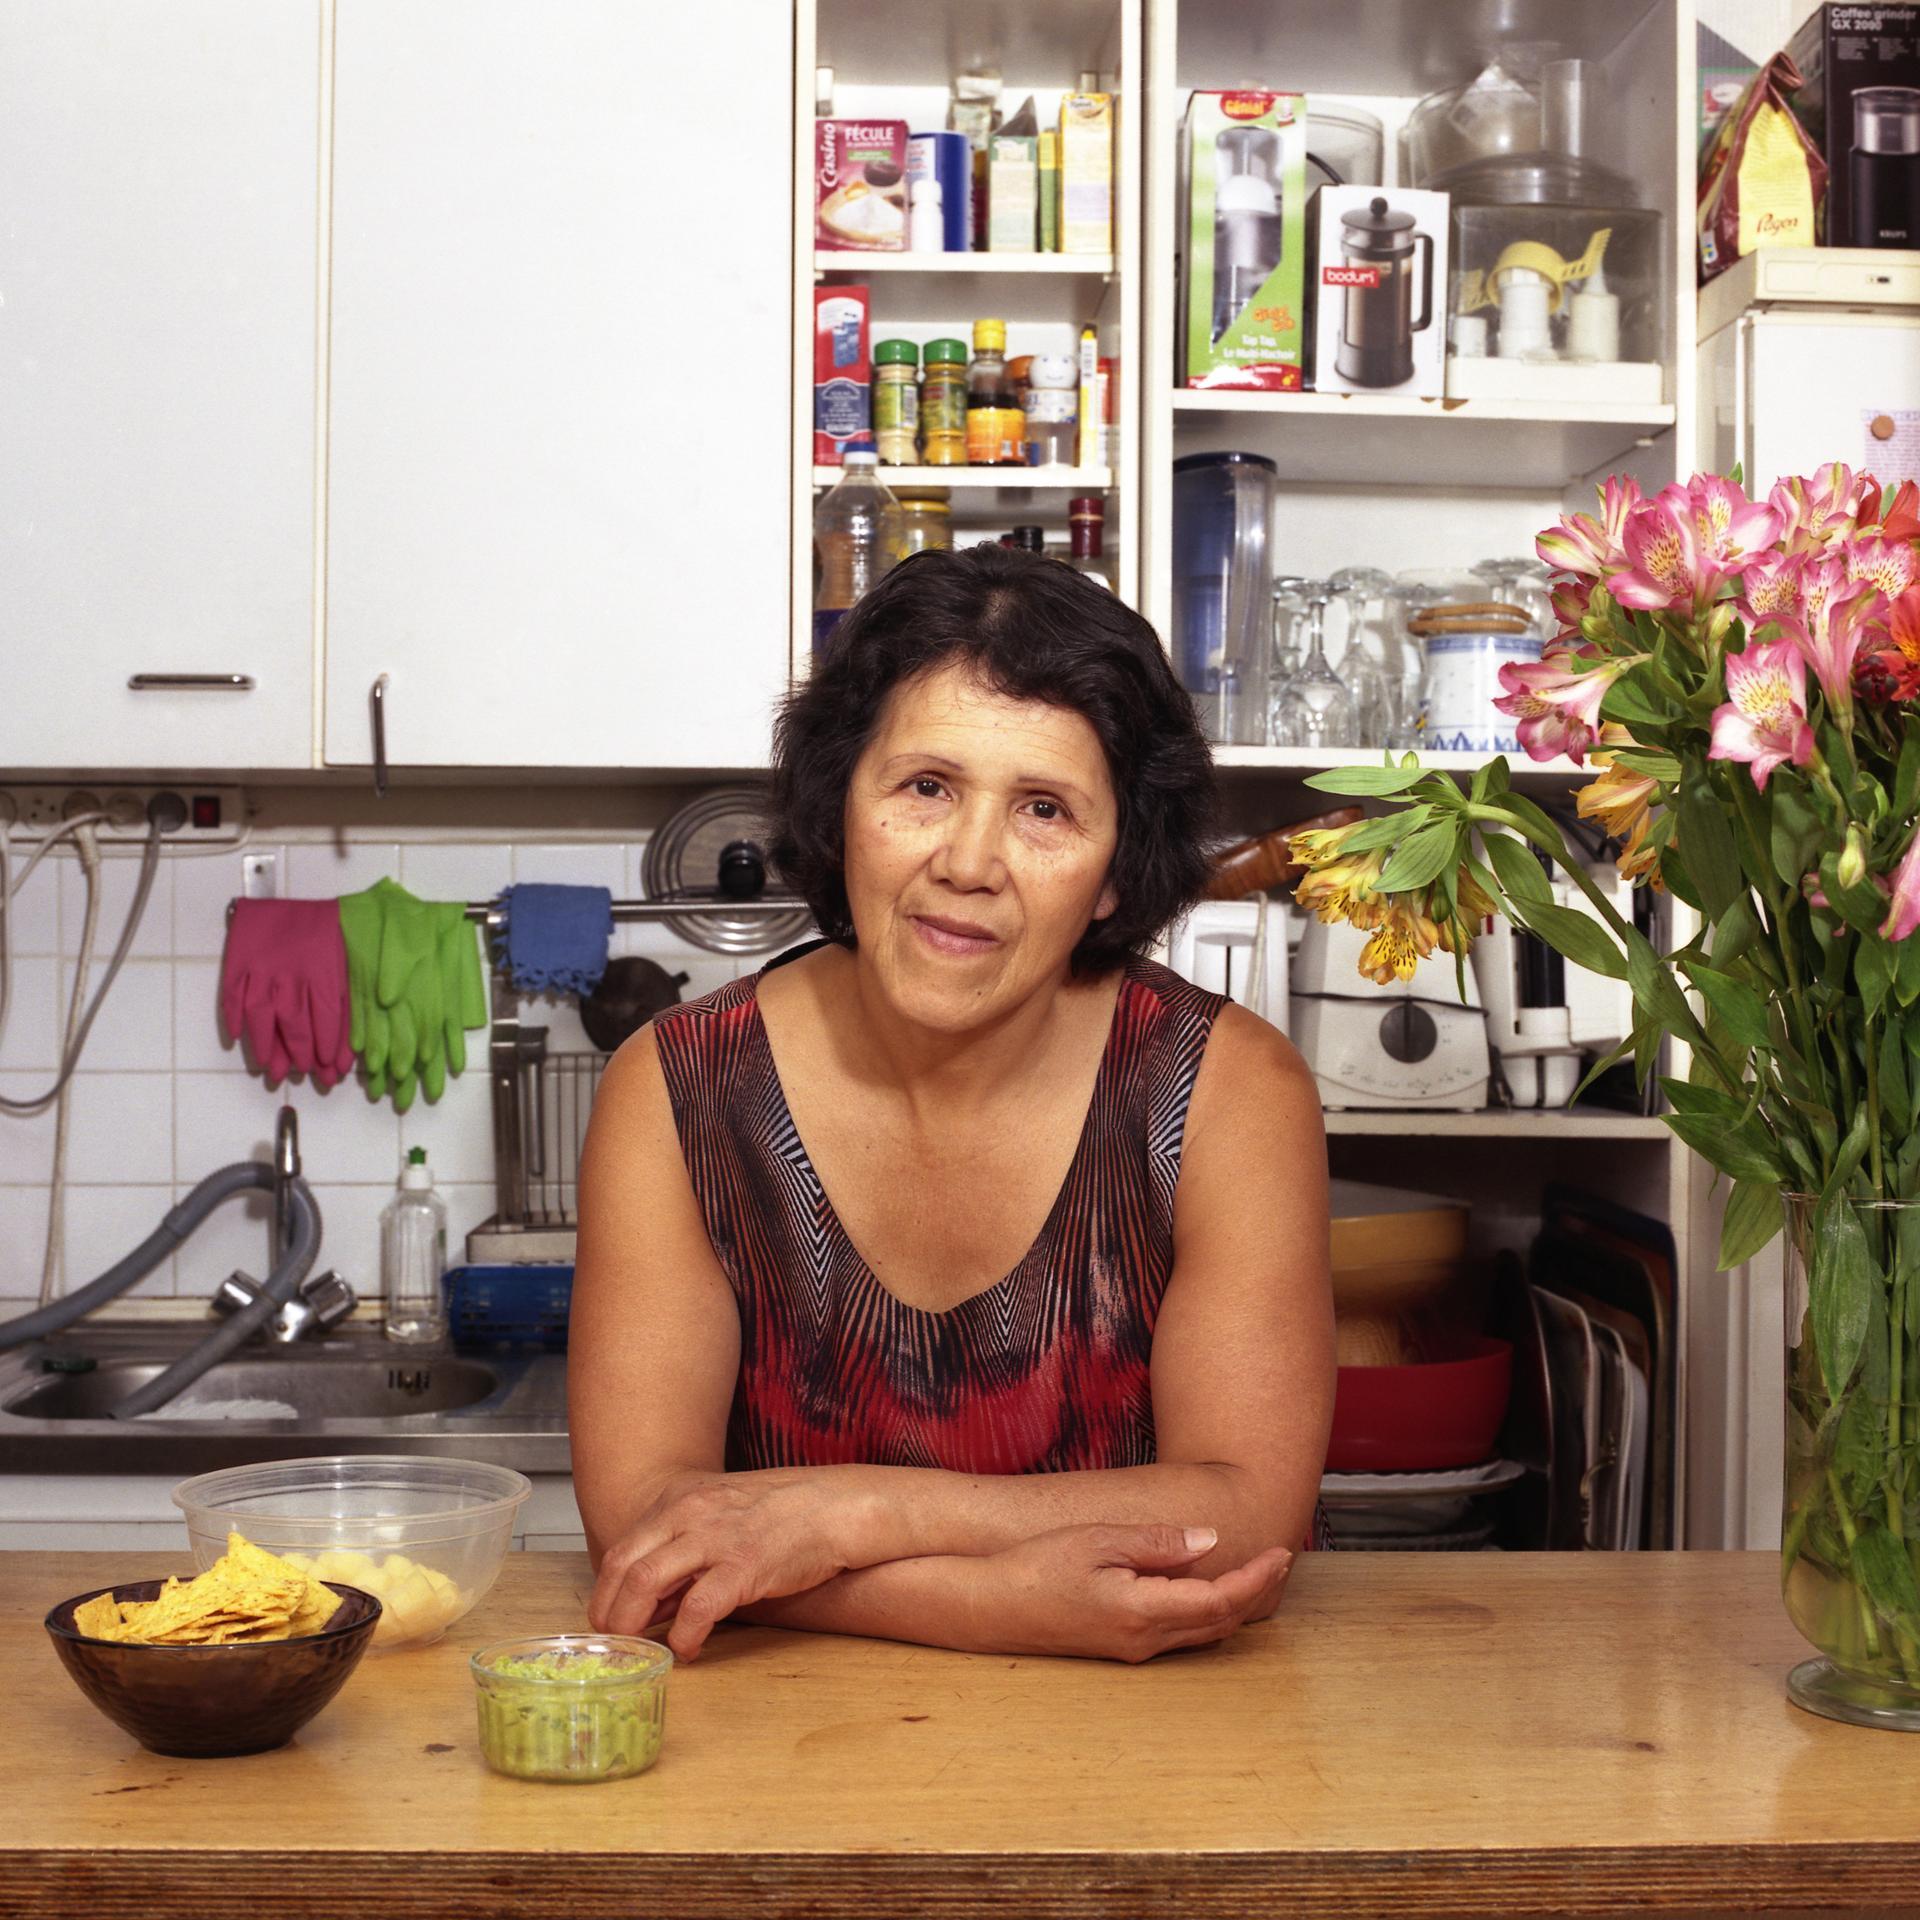 Beatriz CB. - 64 ans